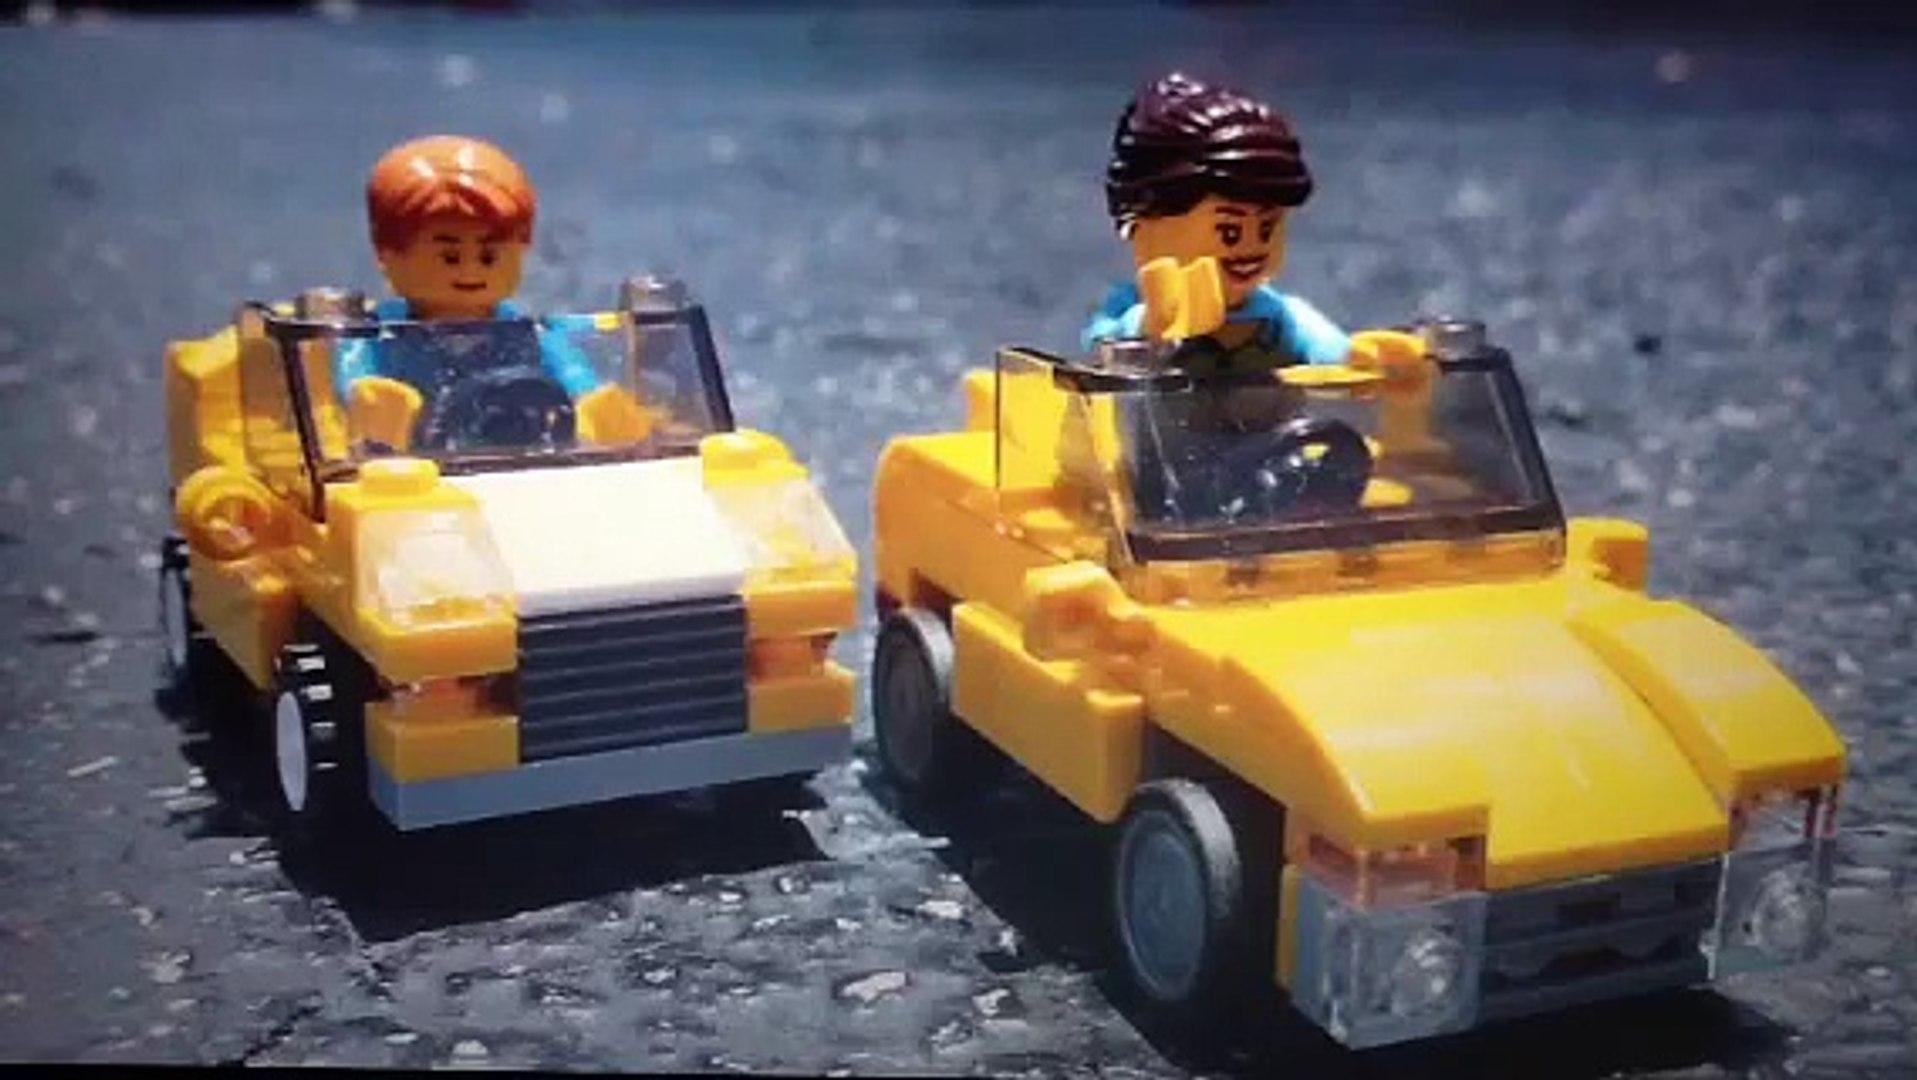 Lego Travel Music- road trip travel